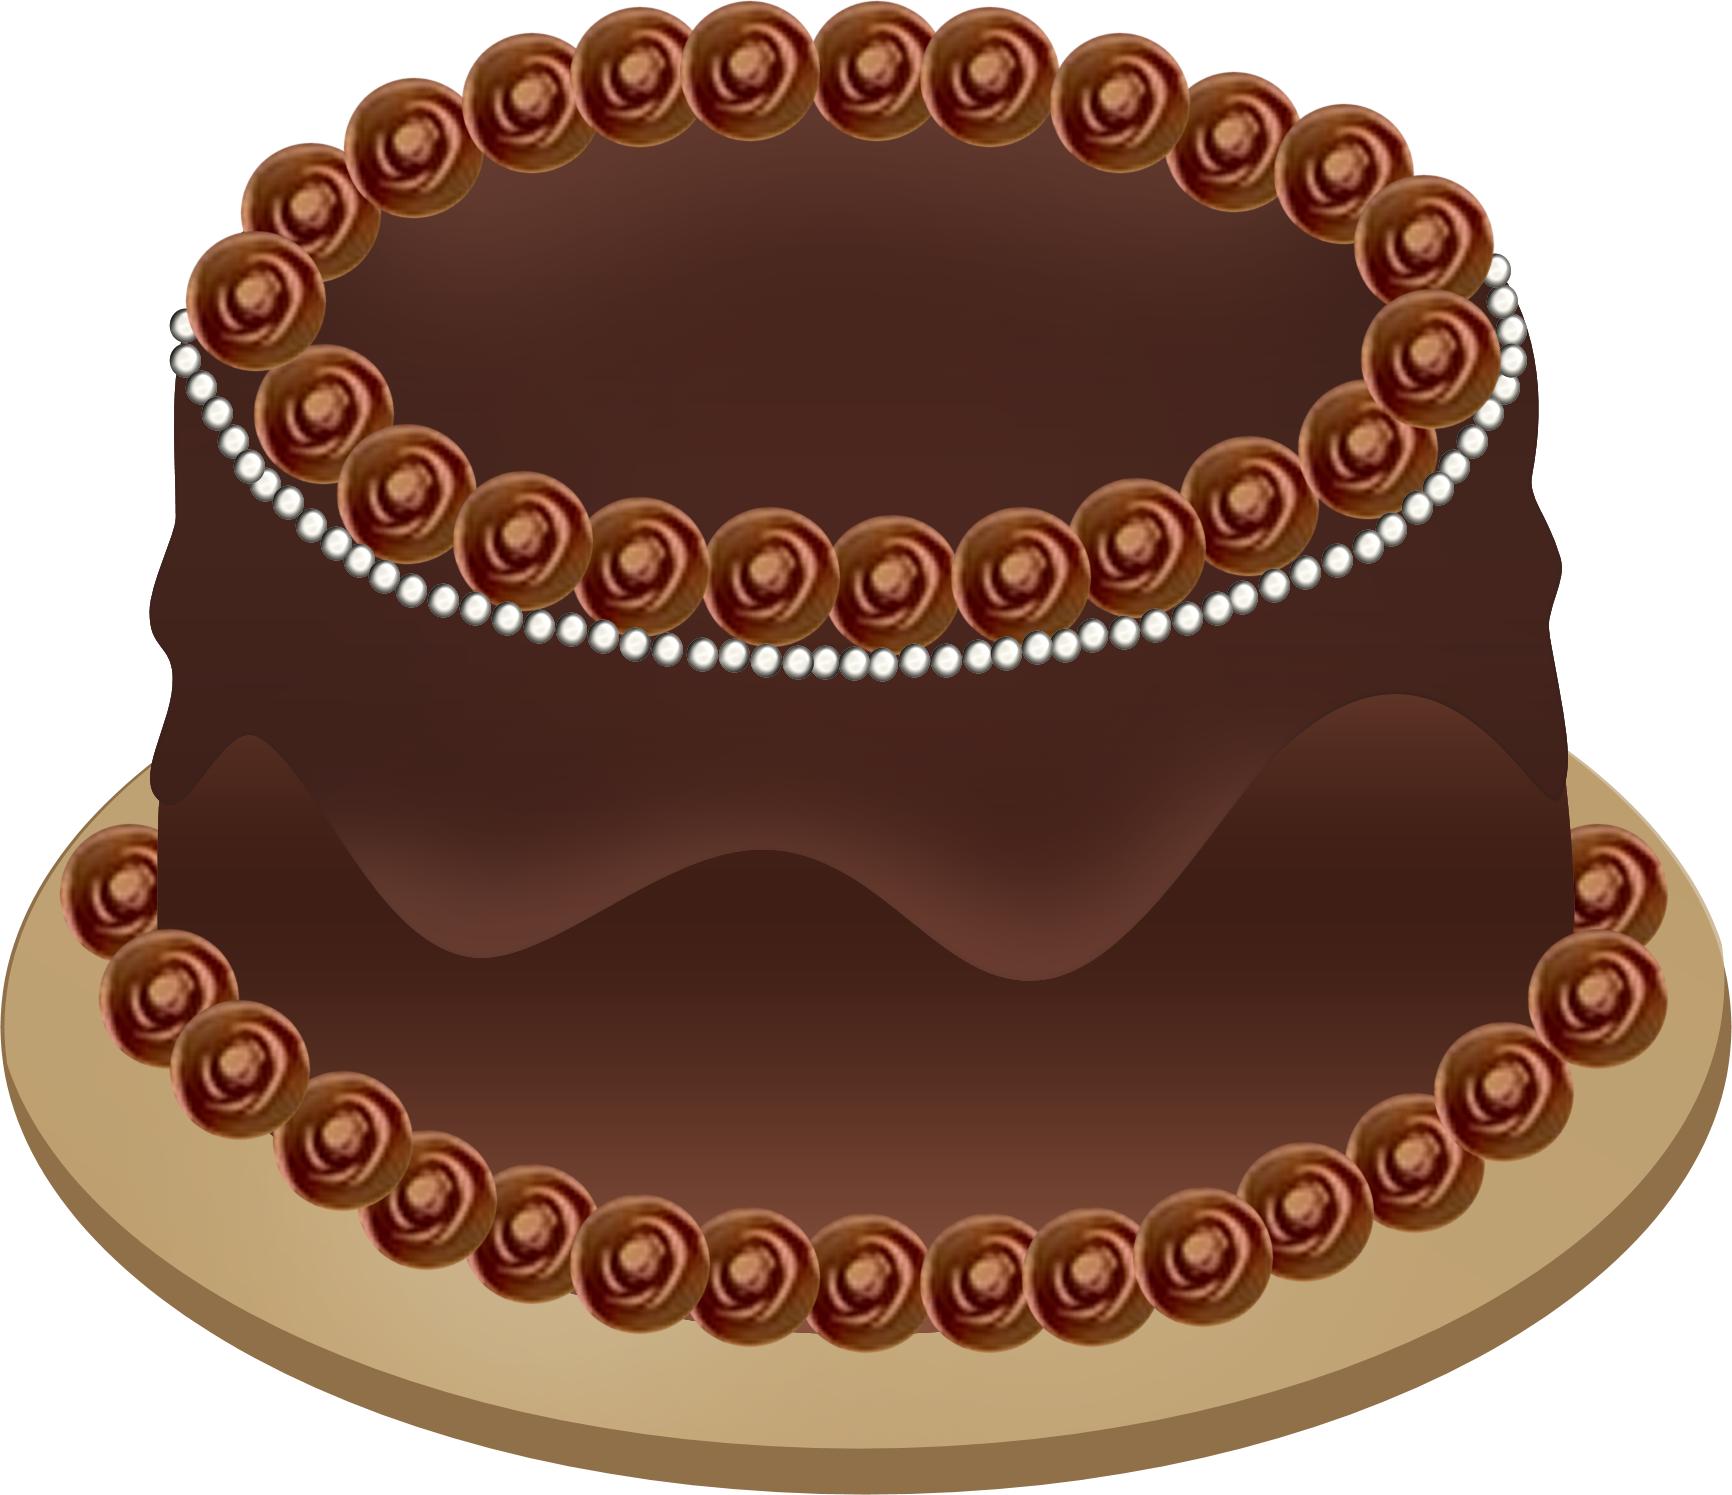 Chocolate Cake PNG HD - 130213